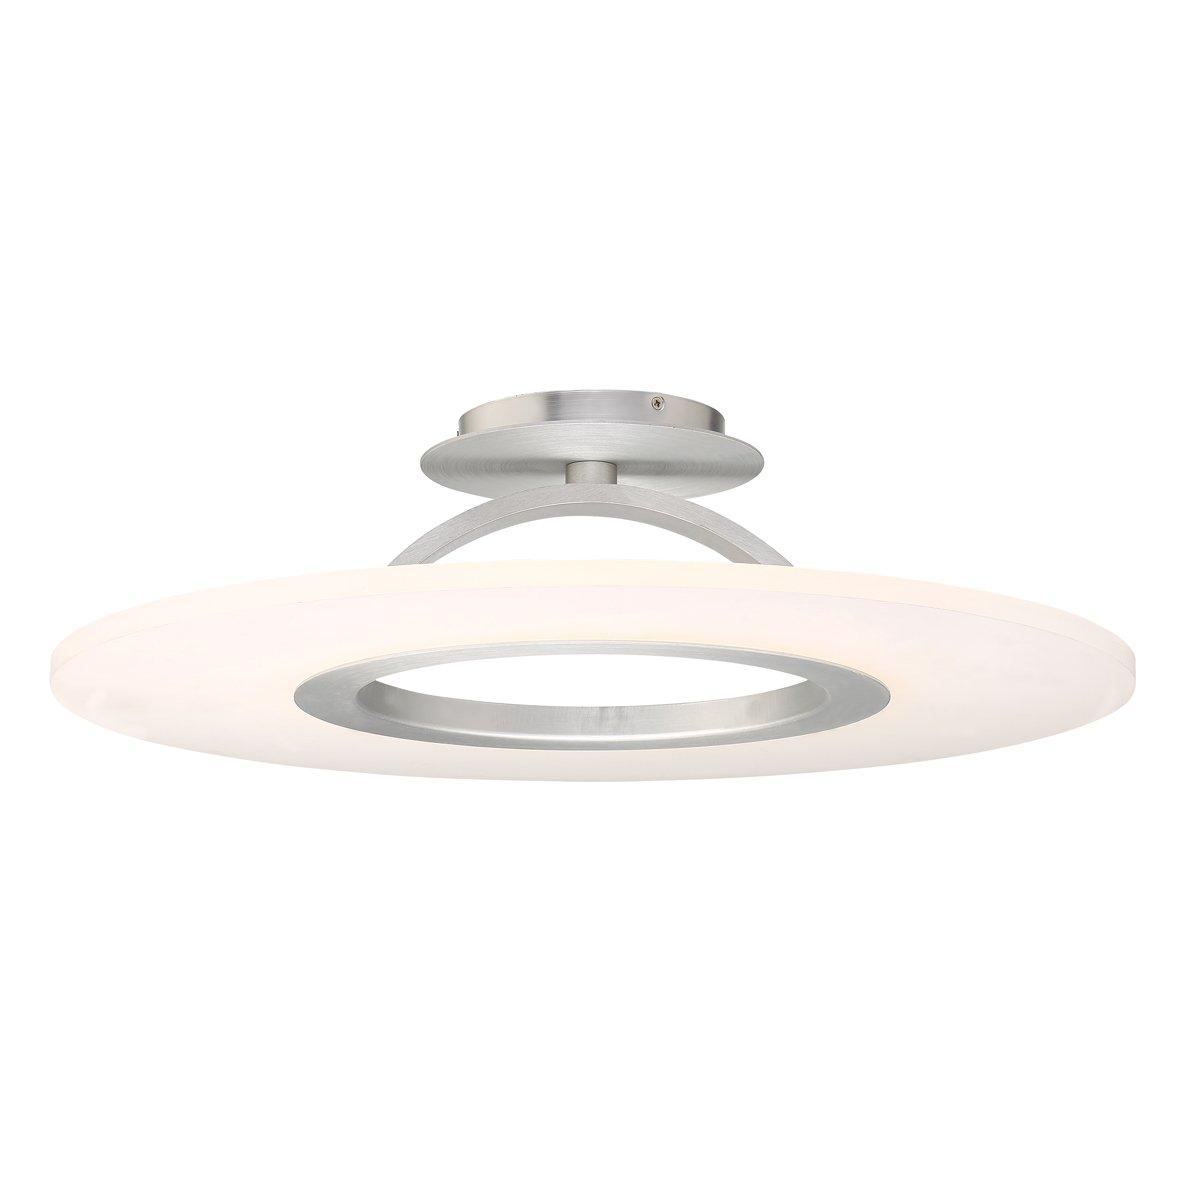 WAC Lighting FM-21728-AL Elektron 28'' LED Convertible Semi-Flush Mount, 28 Inches, Brushed Aluminum